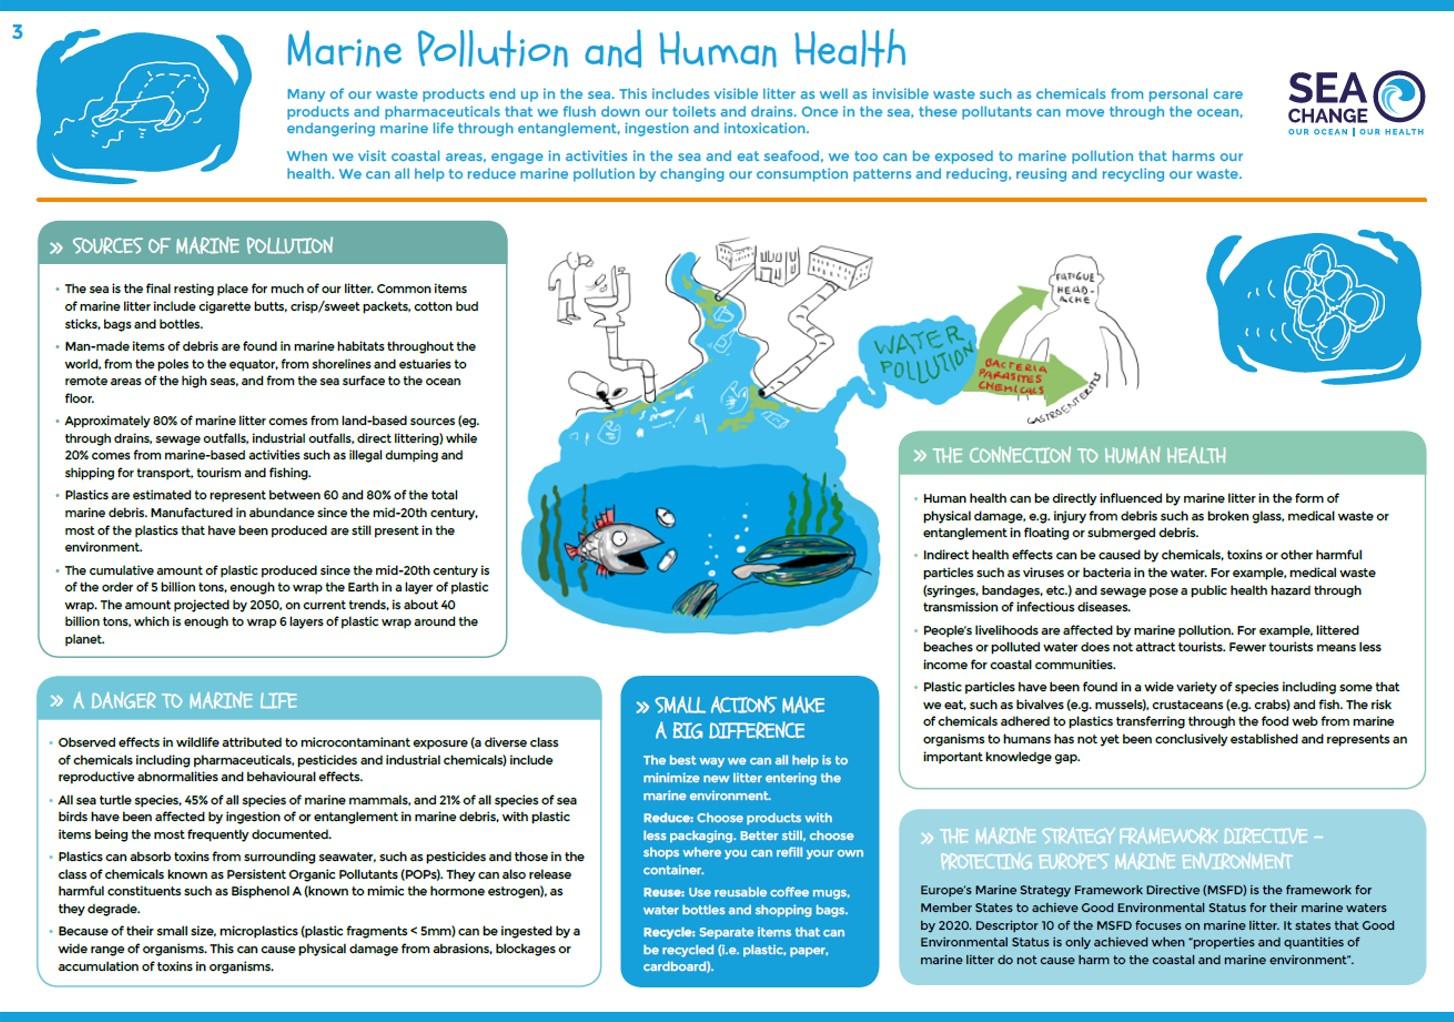 3 - pollution